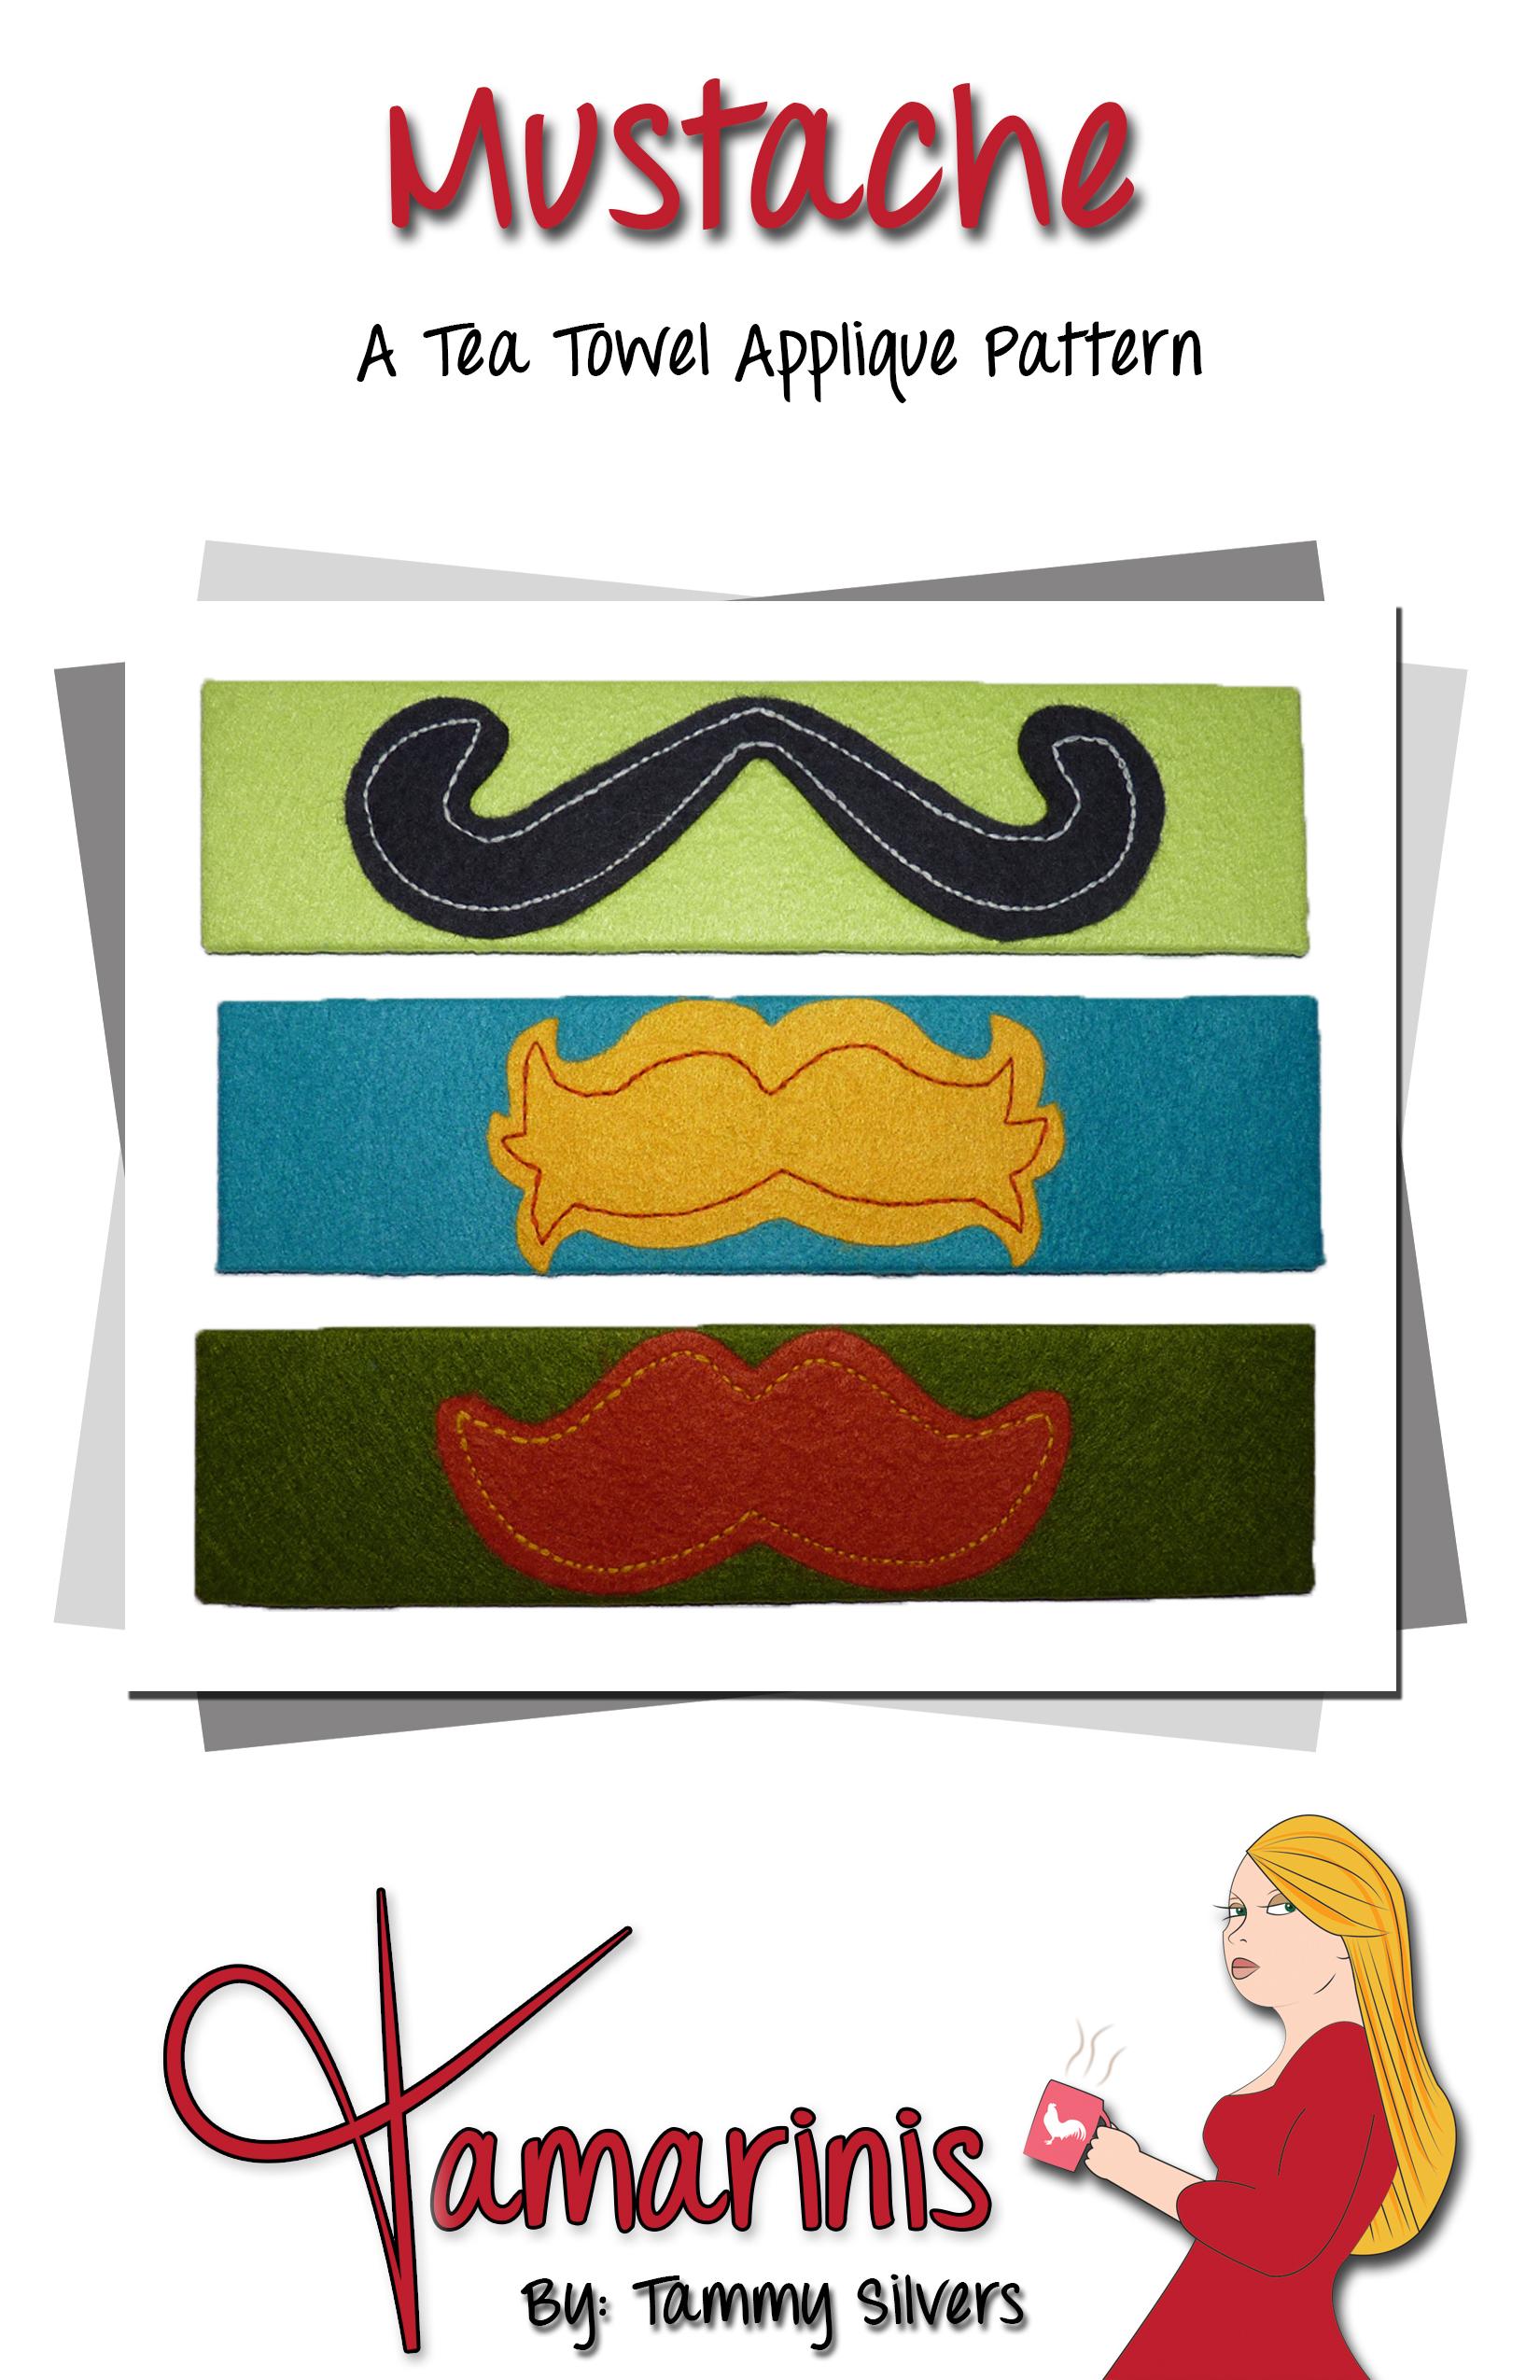 Mustache- Retiring 1/31/19